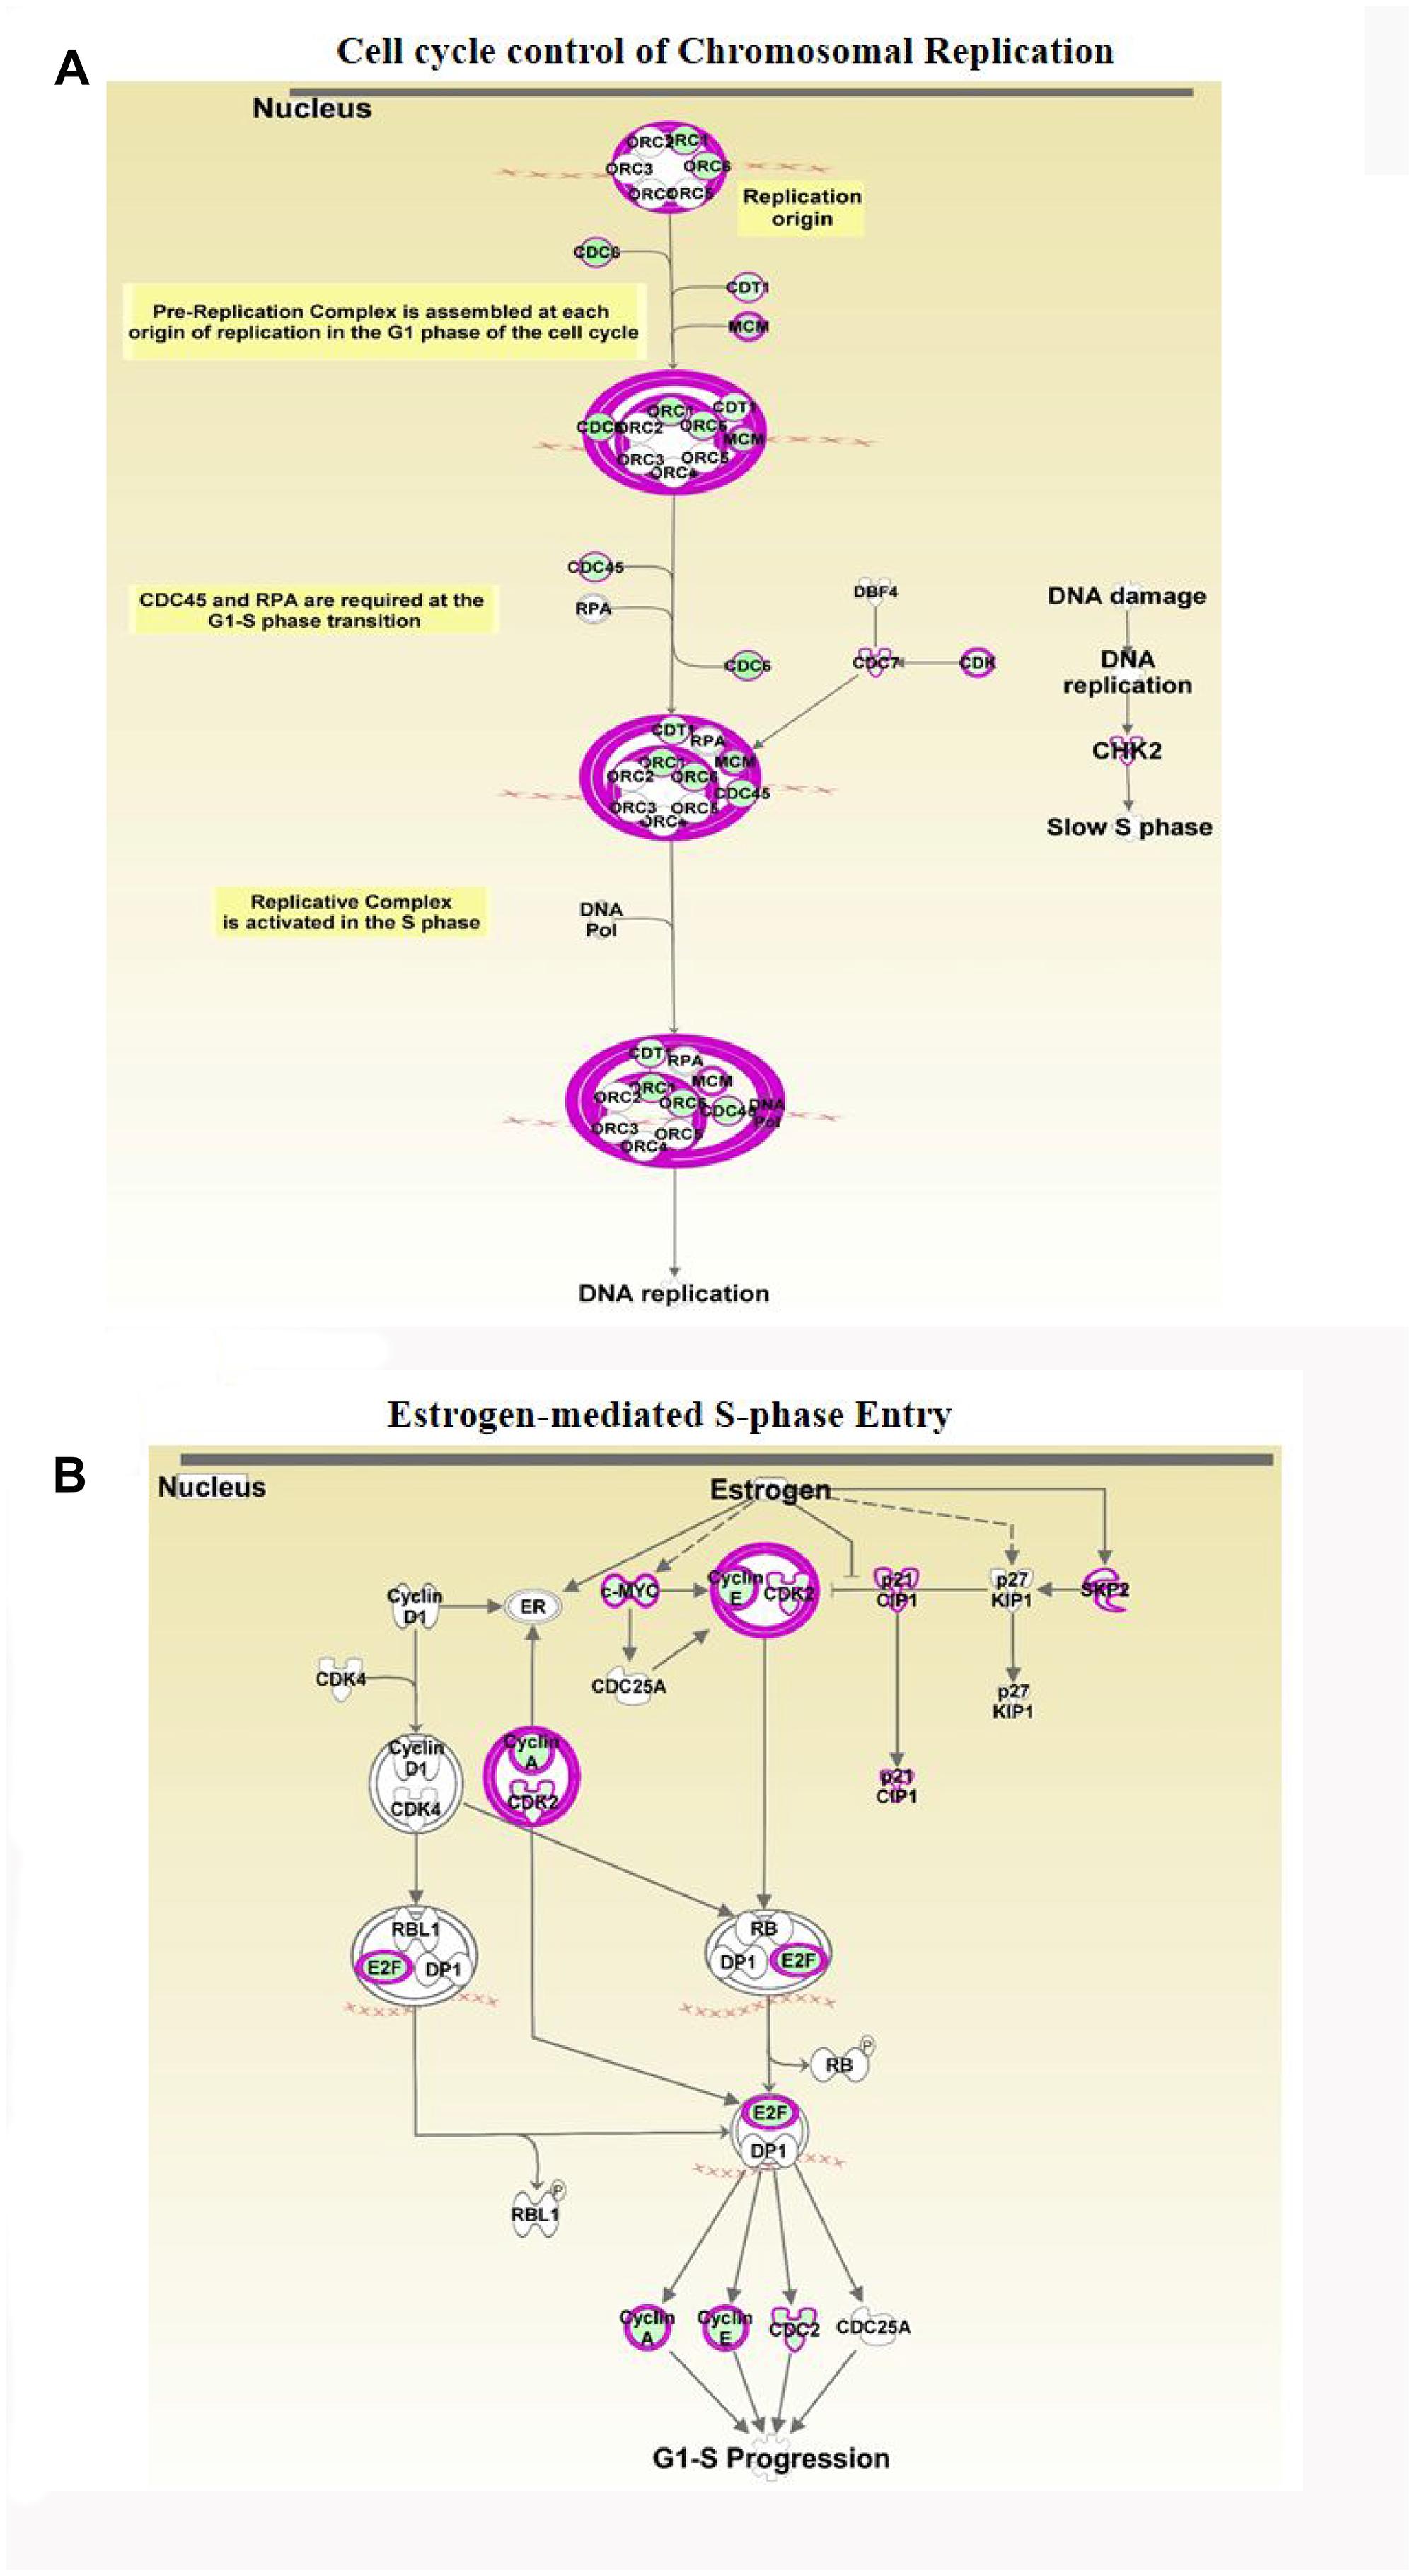 Analyses of ERG-associated cellular pathways.